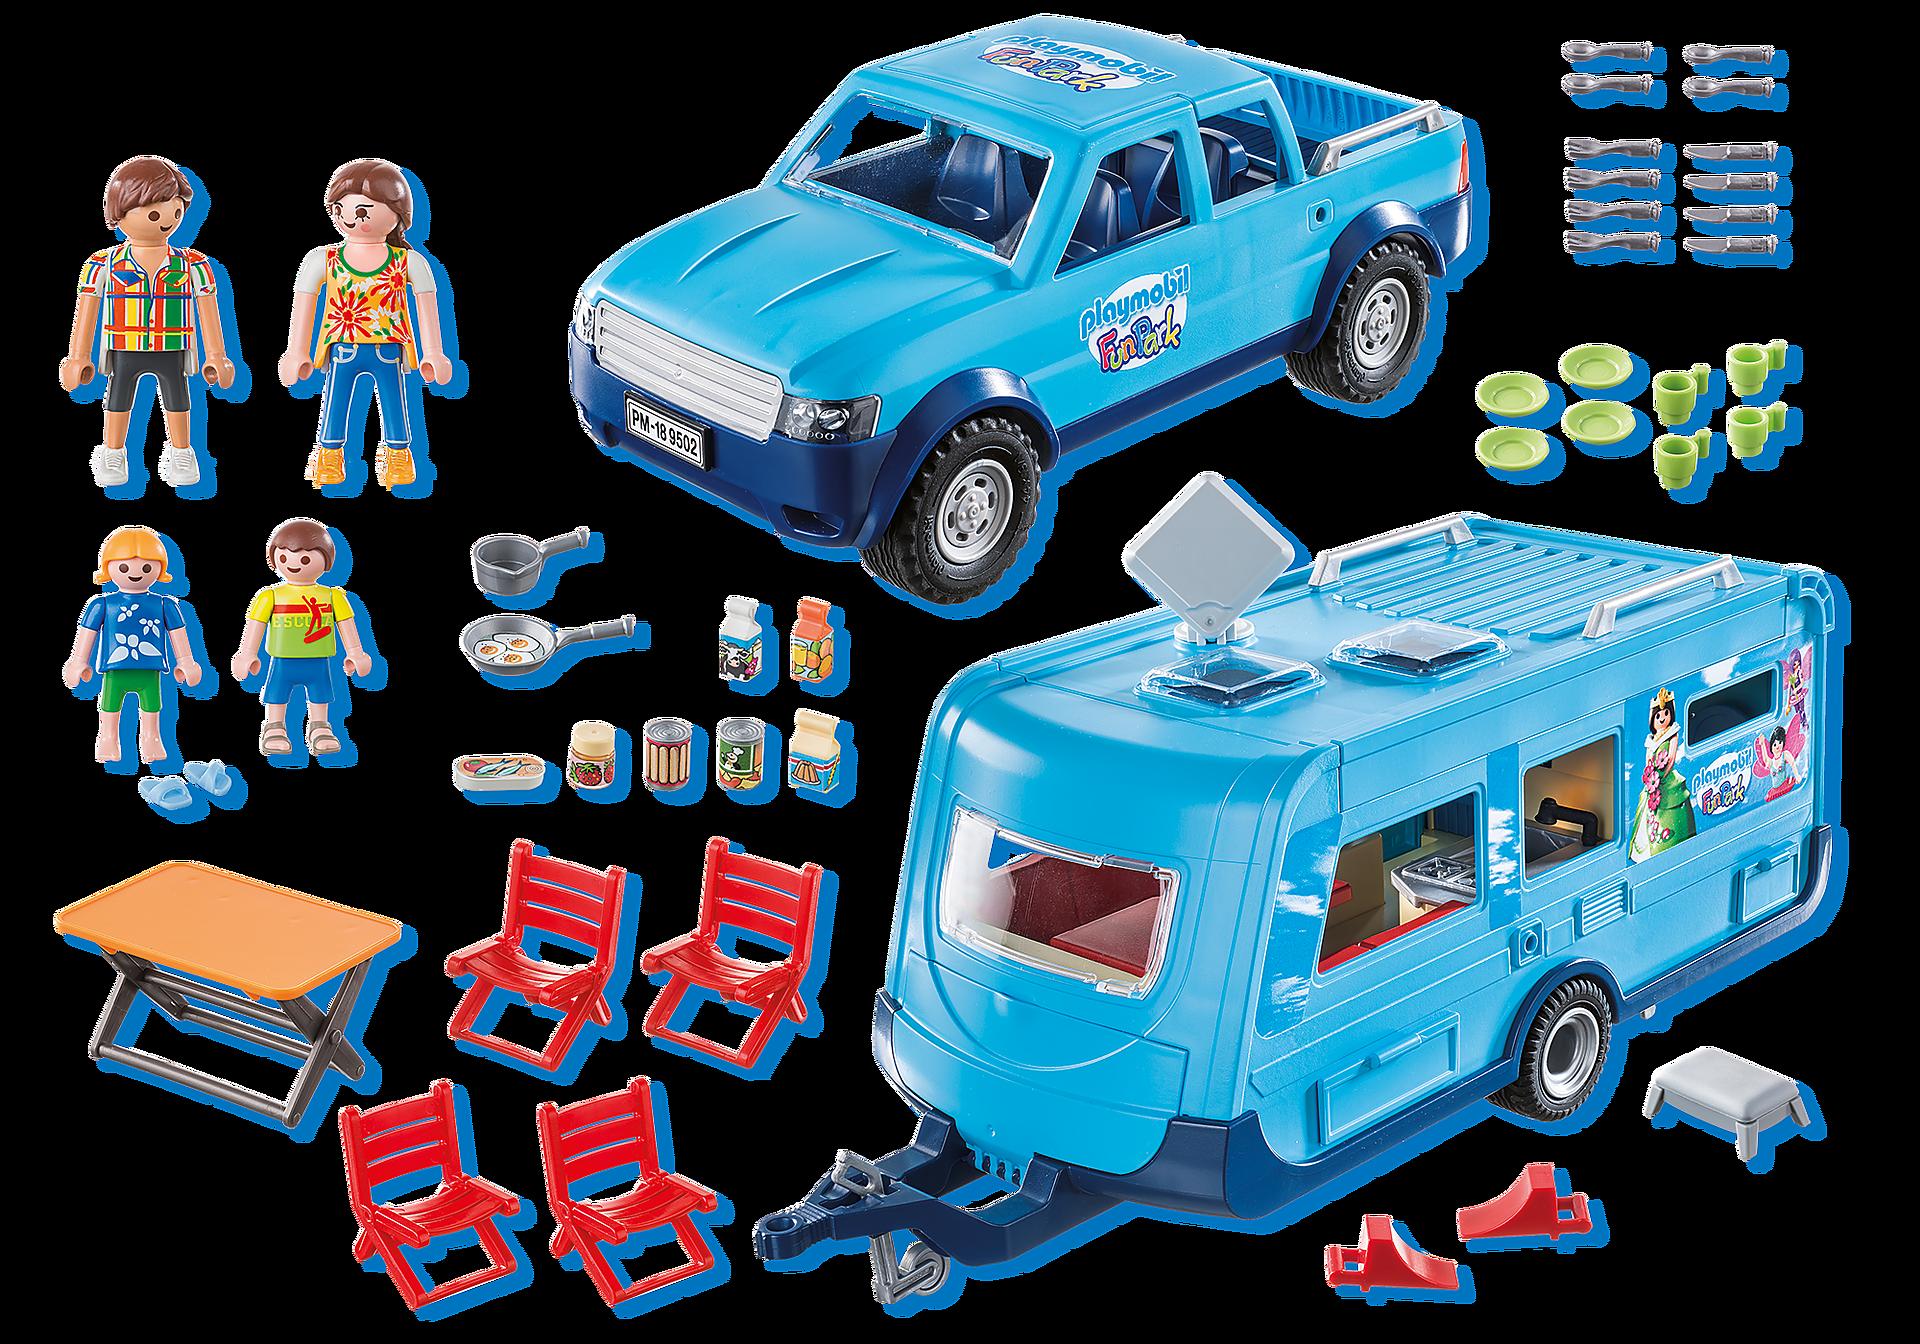 9502 PLAYMOBIL-FunPark Pick-Up mit Wohnwagen zoom image3